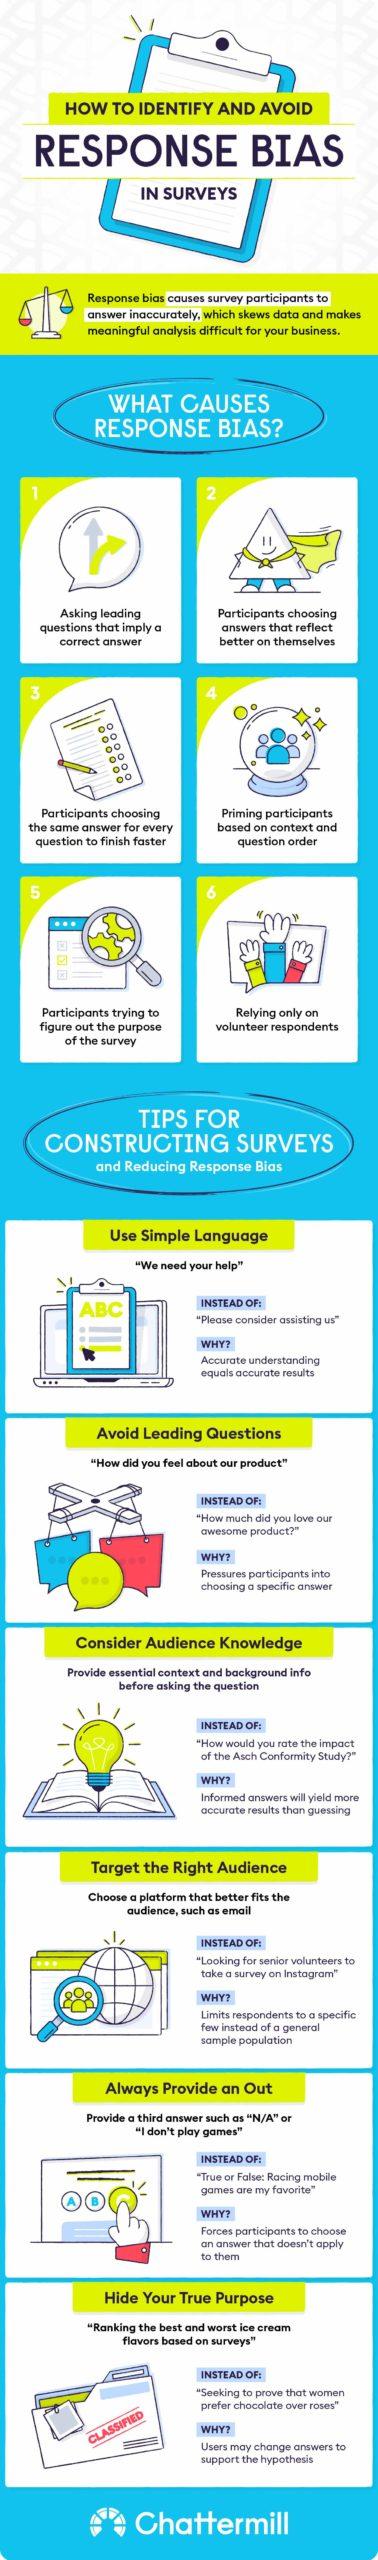 Identify and Avoid Response Bias in Surveys